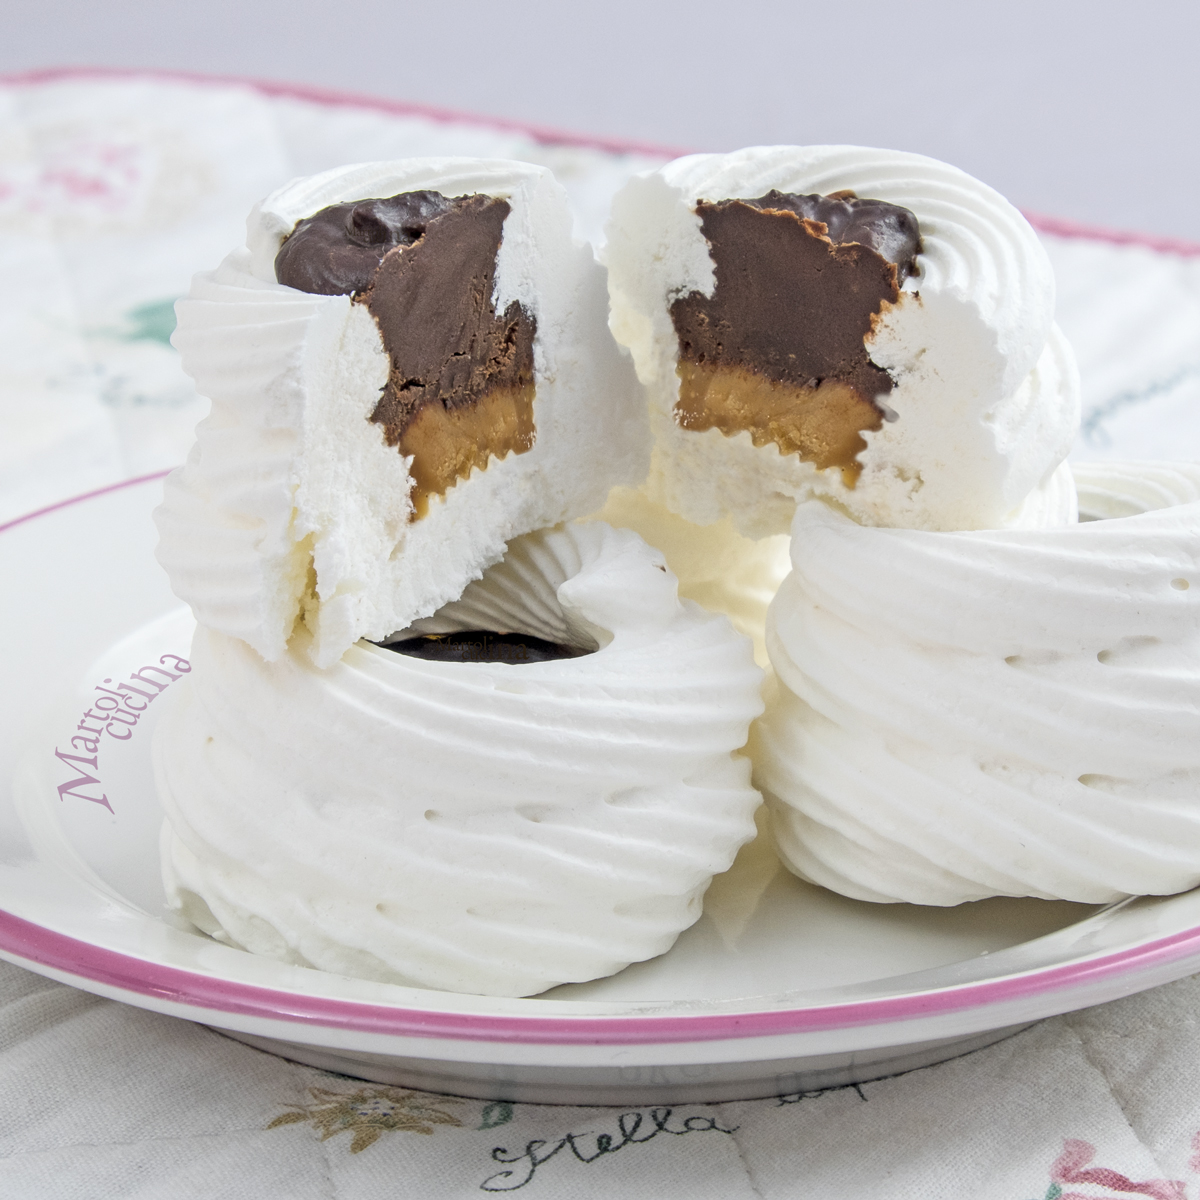 Cestini-meringa-caramello-cioccolato-sale-C1200x1200